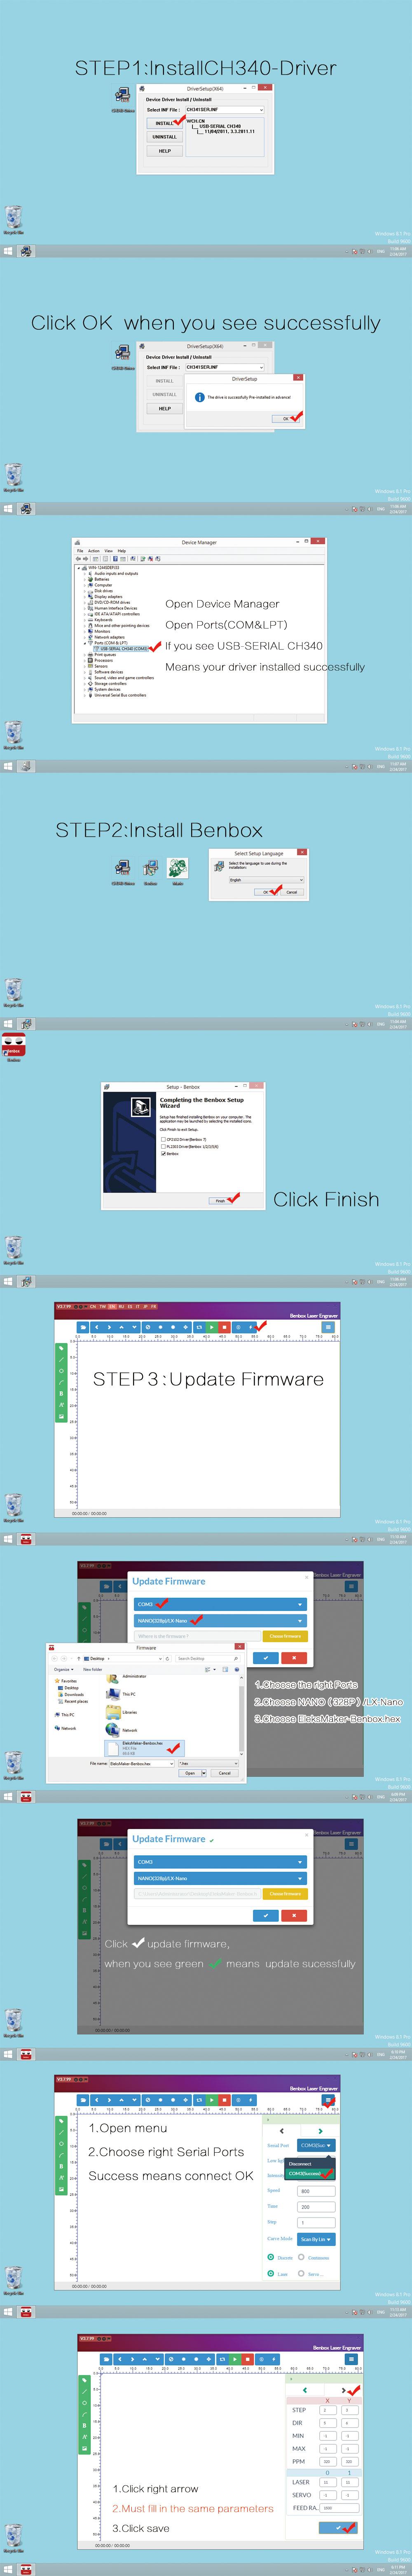 0_1487946562096_benbox安装说明-WEB1000.jpg